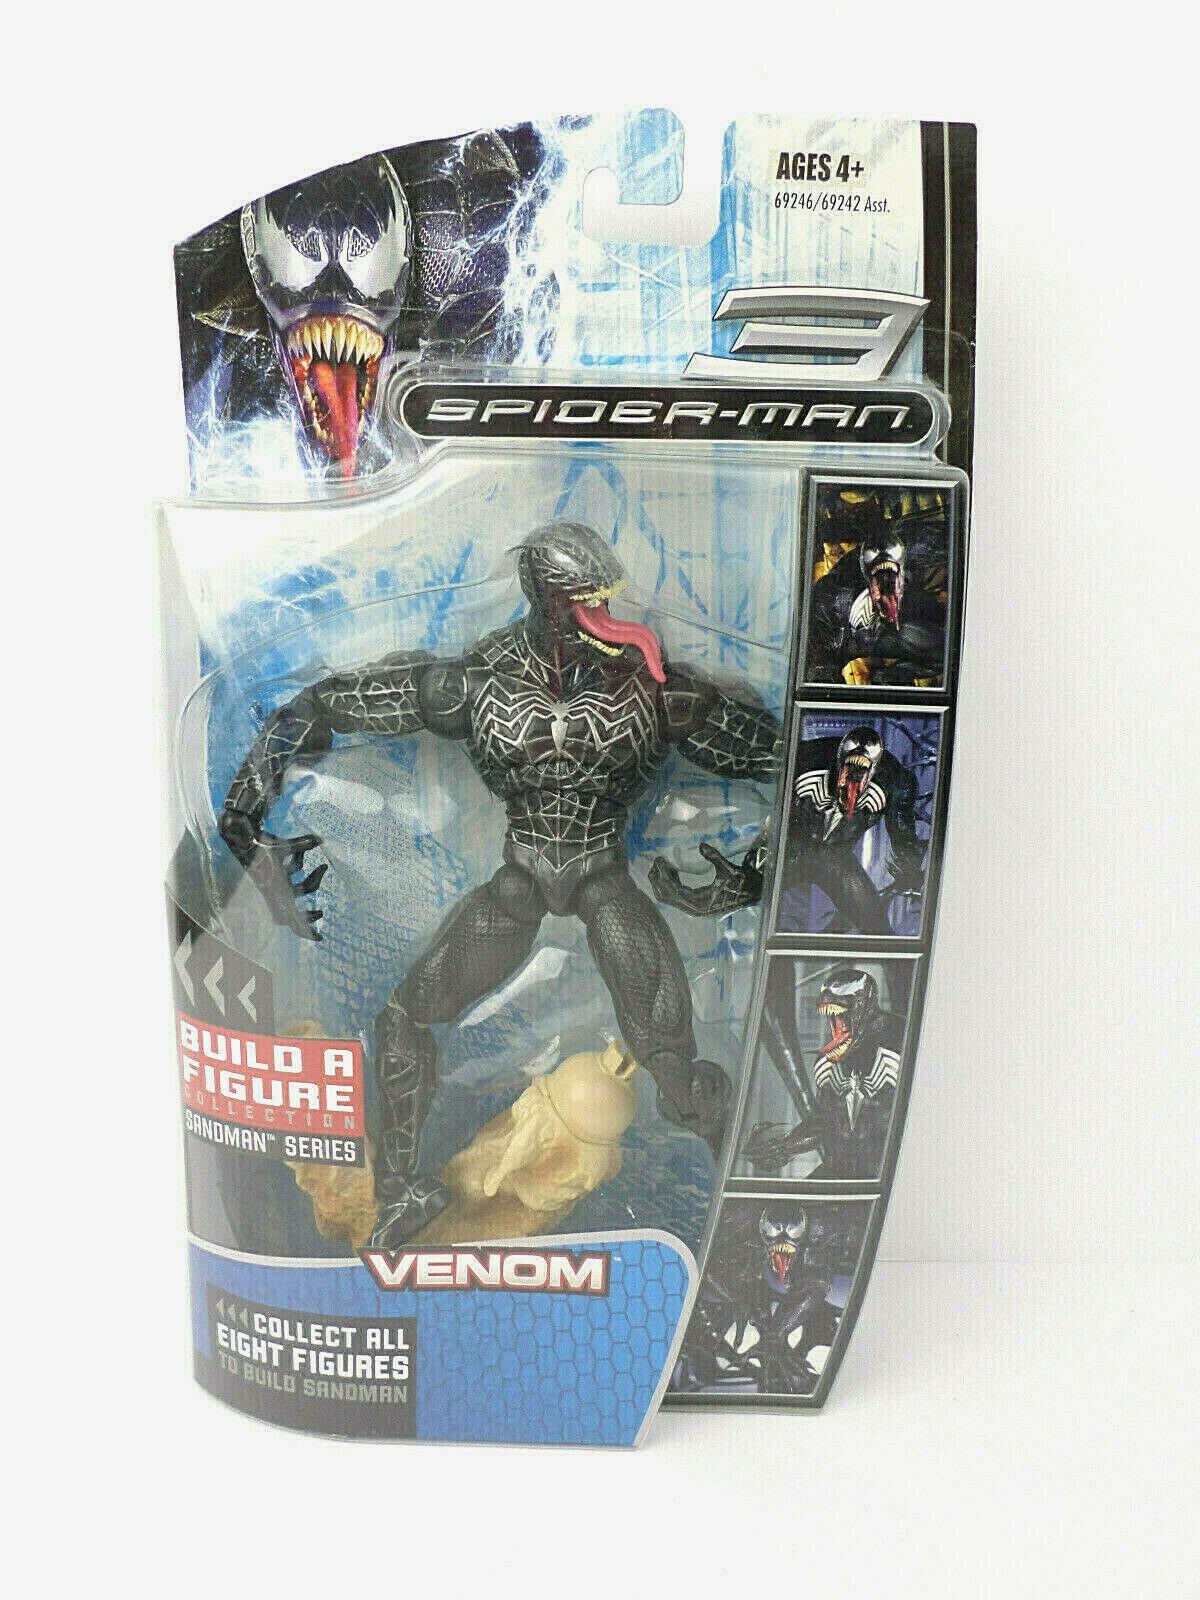 Venom Spider-Man 3 Sandman Series Build-a-Figure - Hasbro Factory Sealed 2007